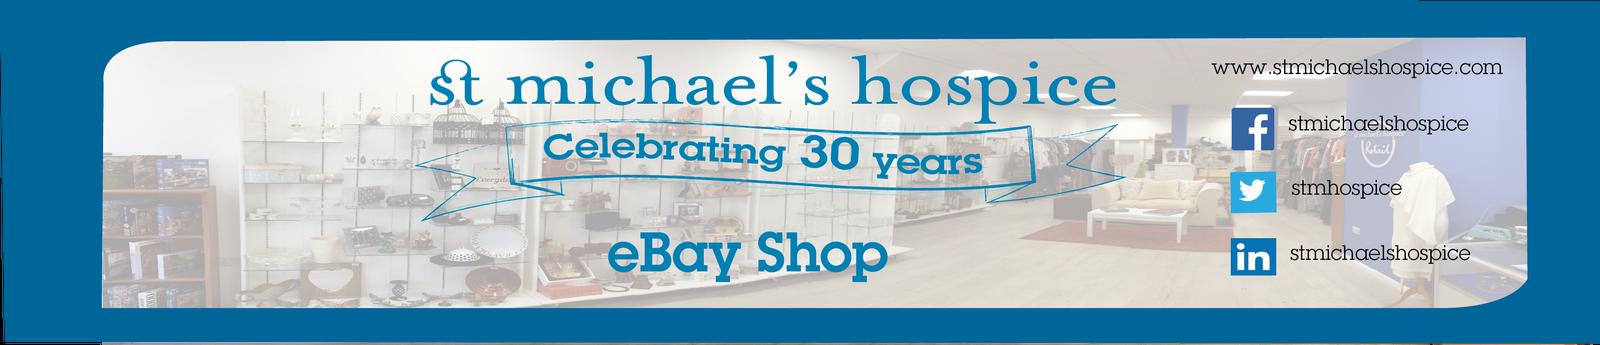 St Michael's Hospice eBay Shop